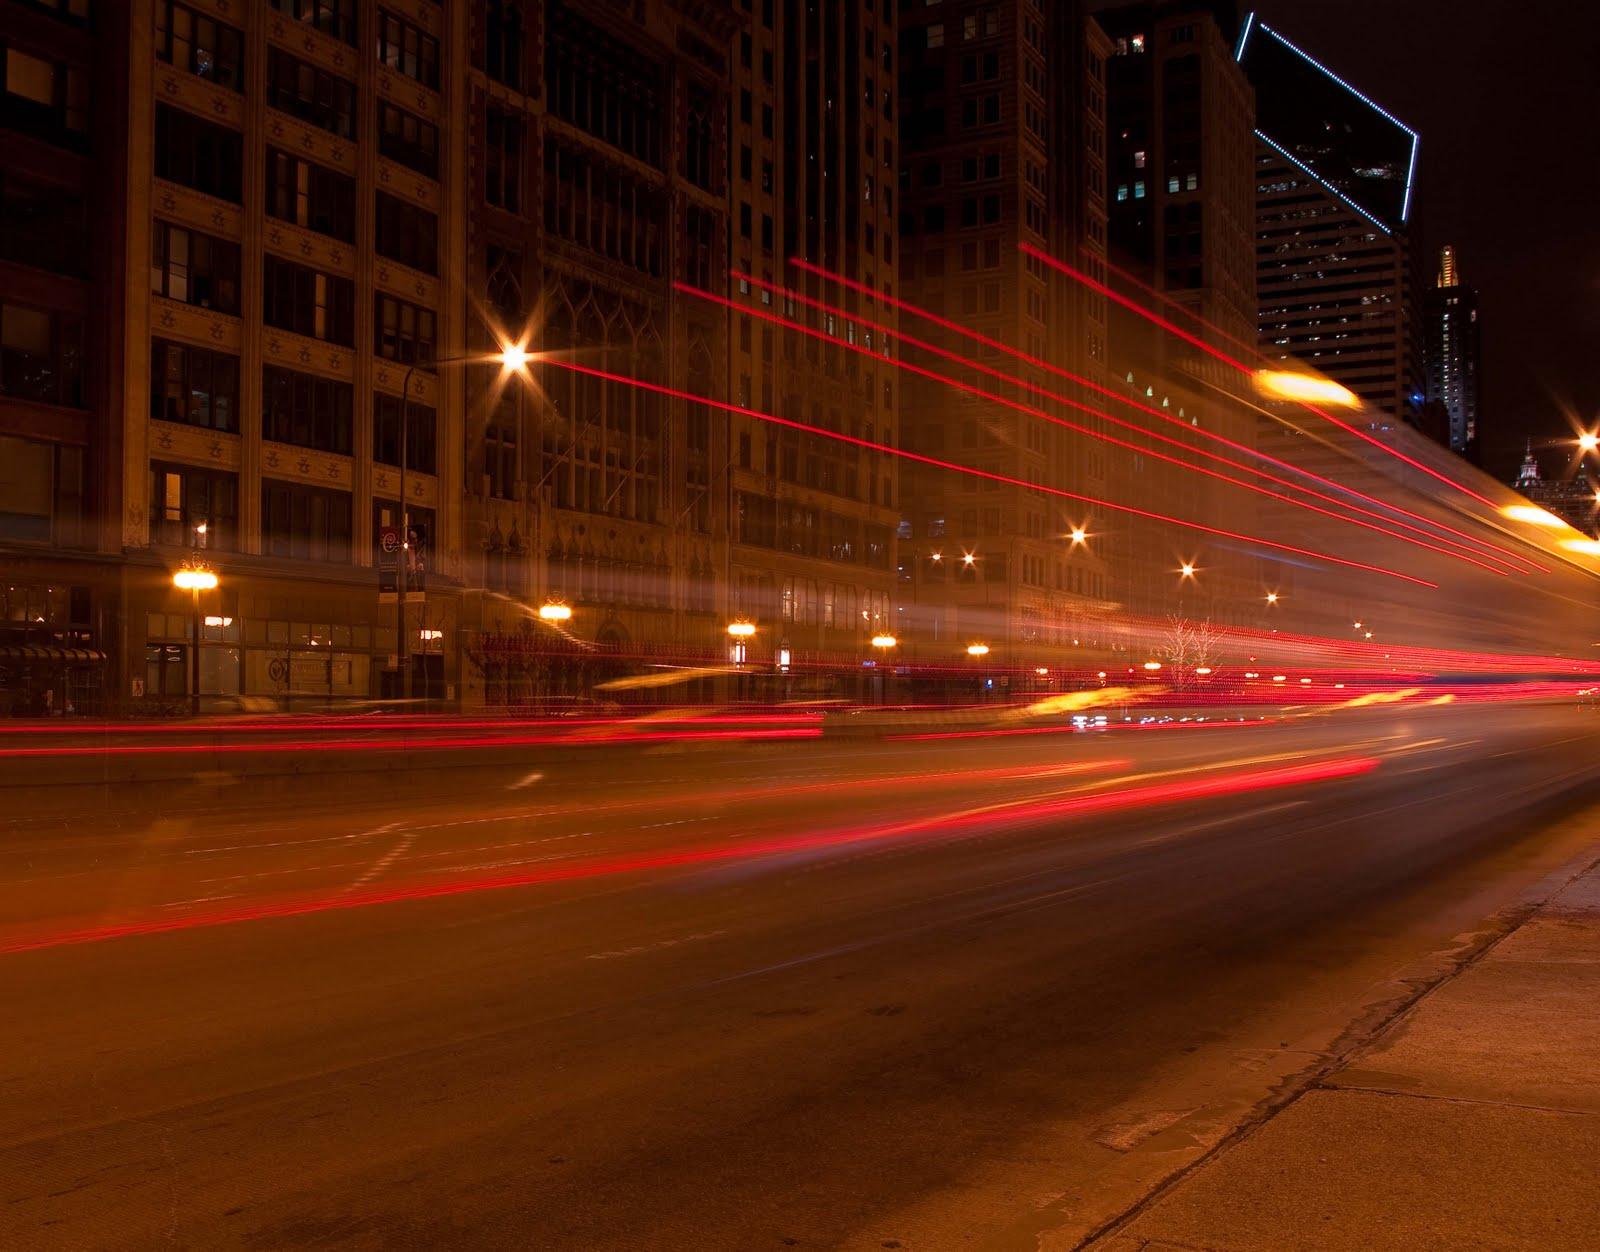 Photographing Carnival Rides At Night Displaying 20> Imag...